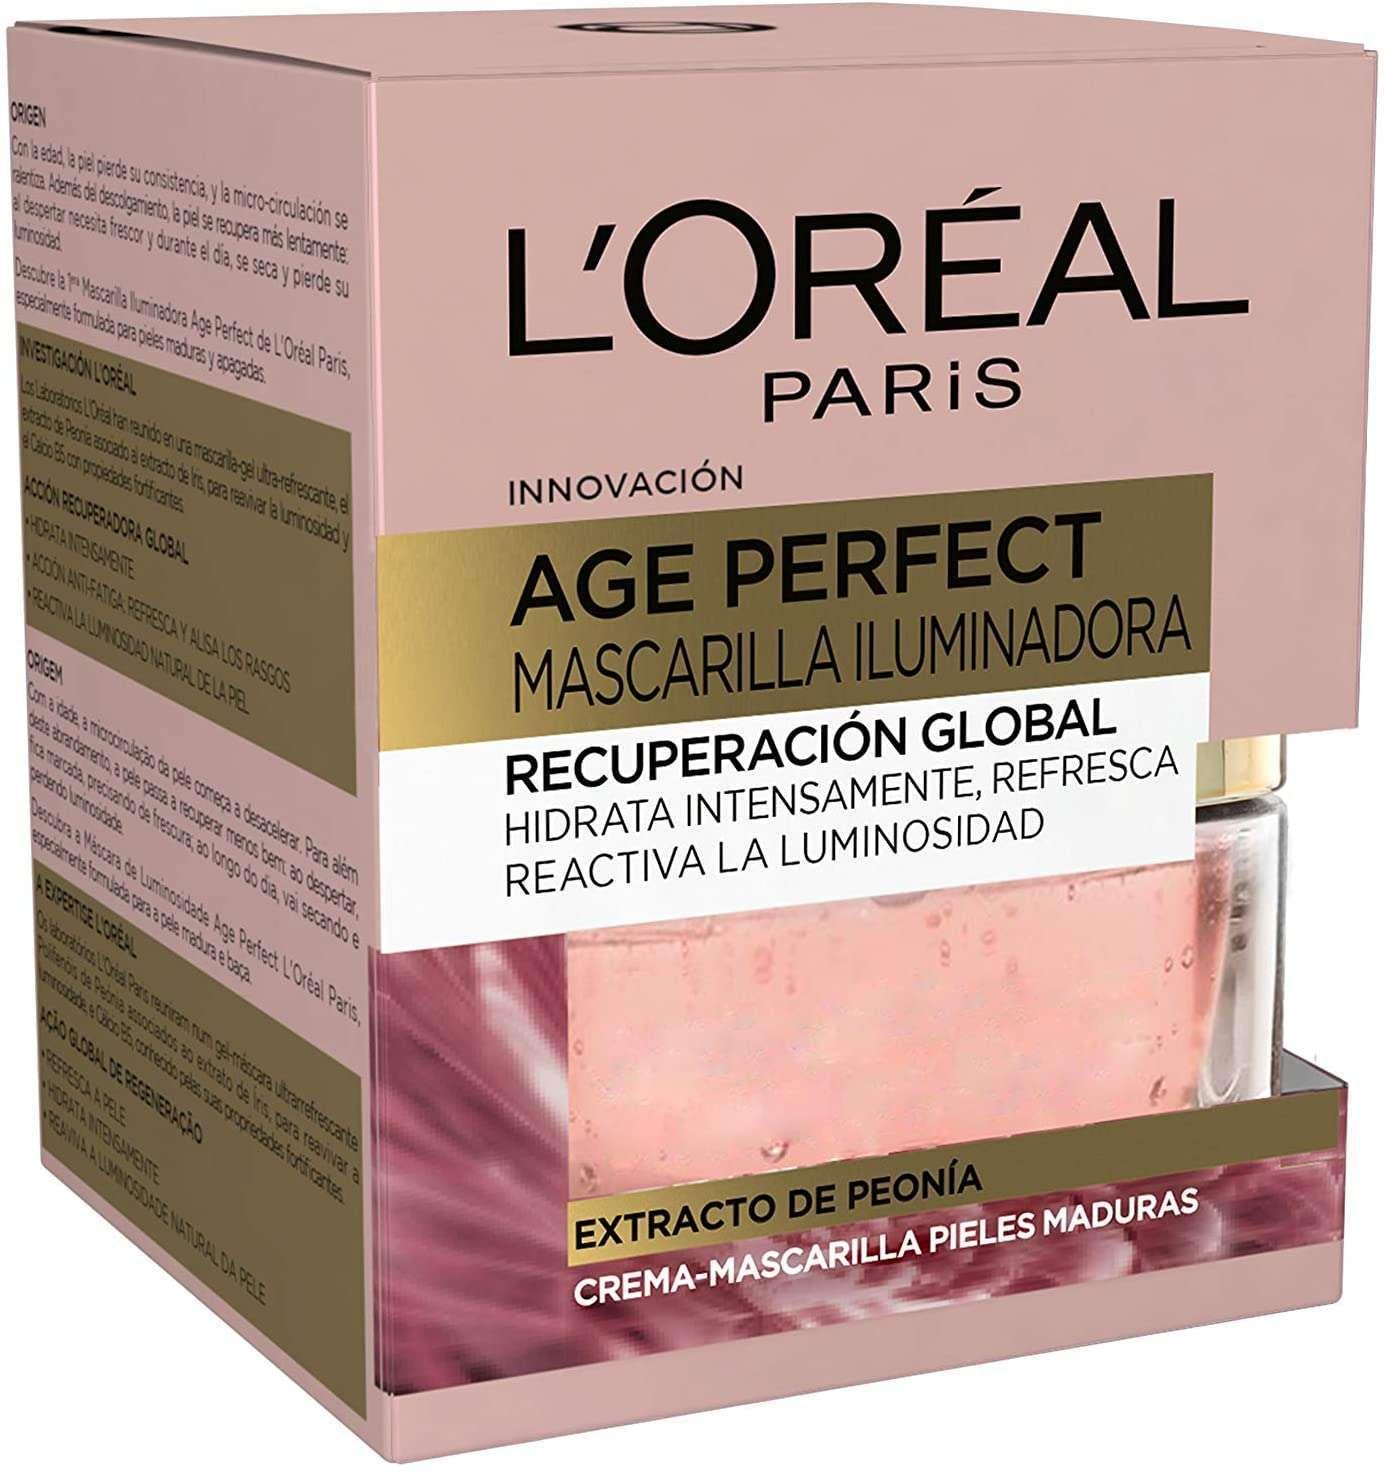 L'Oreal Paris - Age perfect, crema mascarilla iluminadora empaque